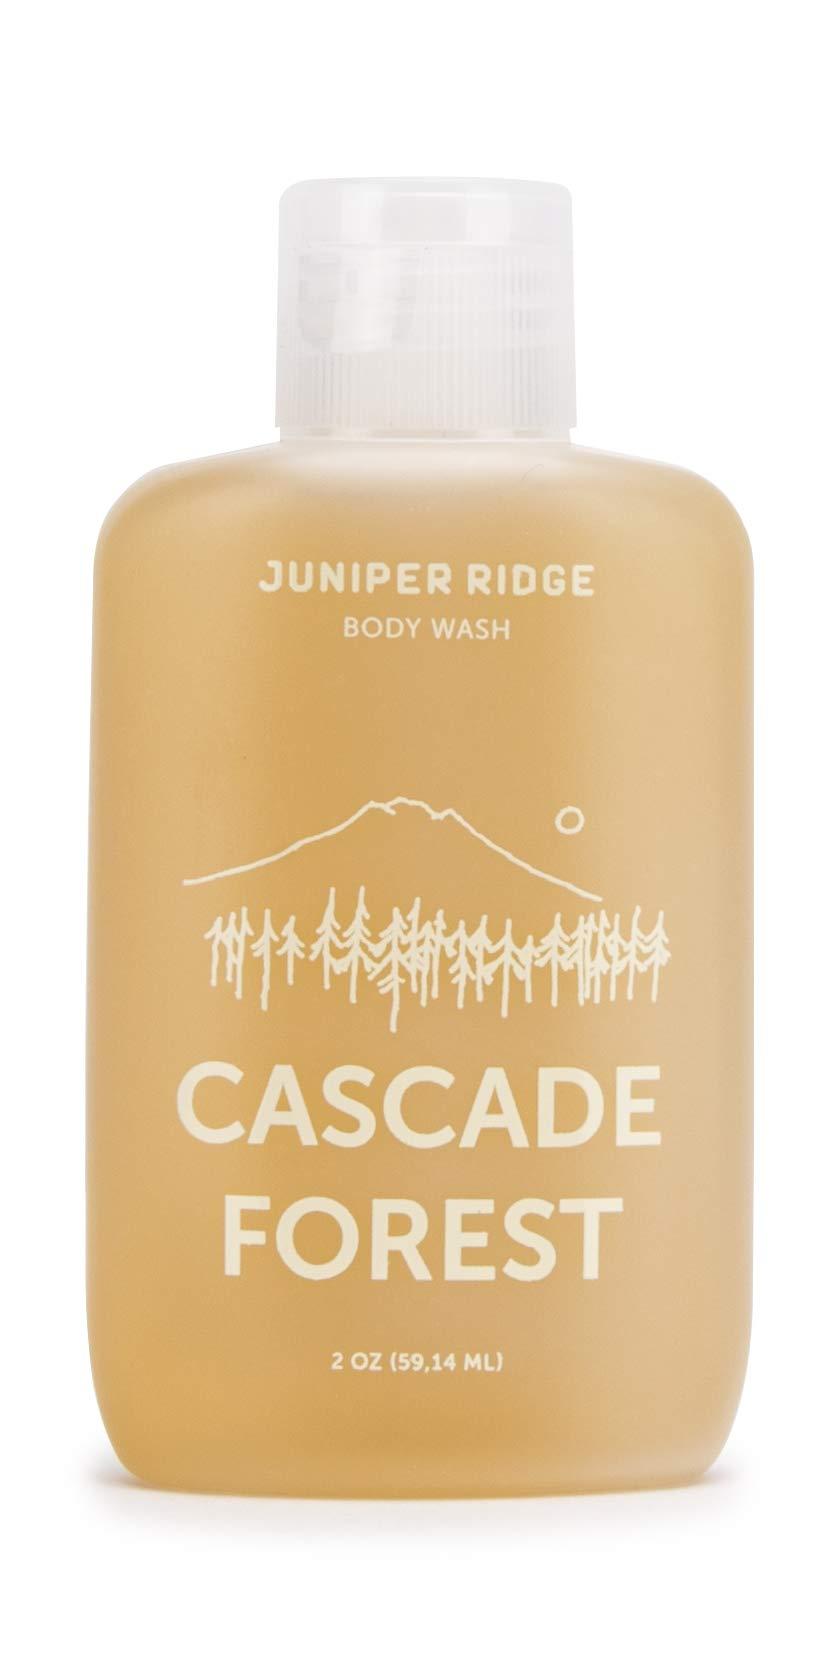 Juniper Ridge Body Wash - Cascade Forest - 2 oz